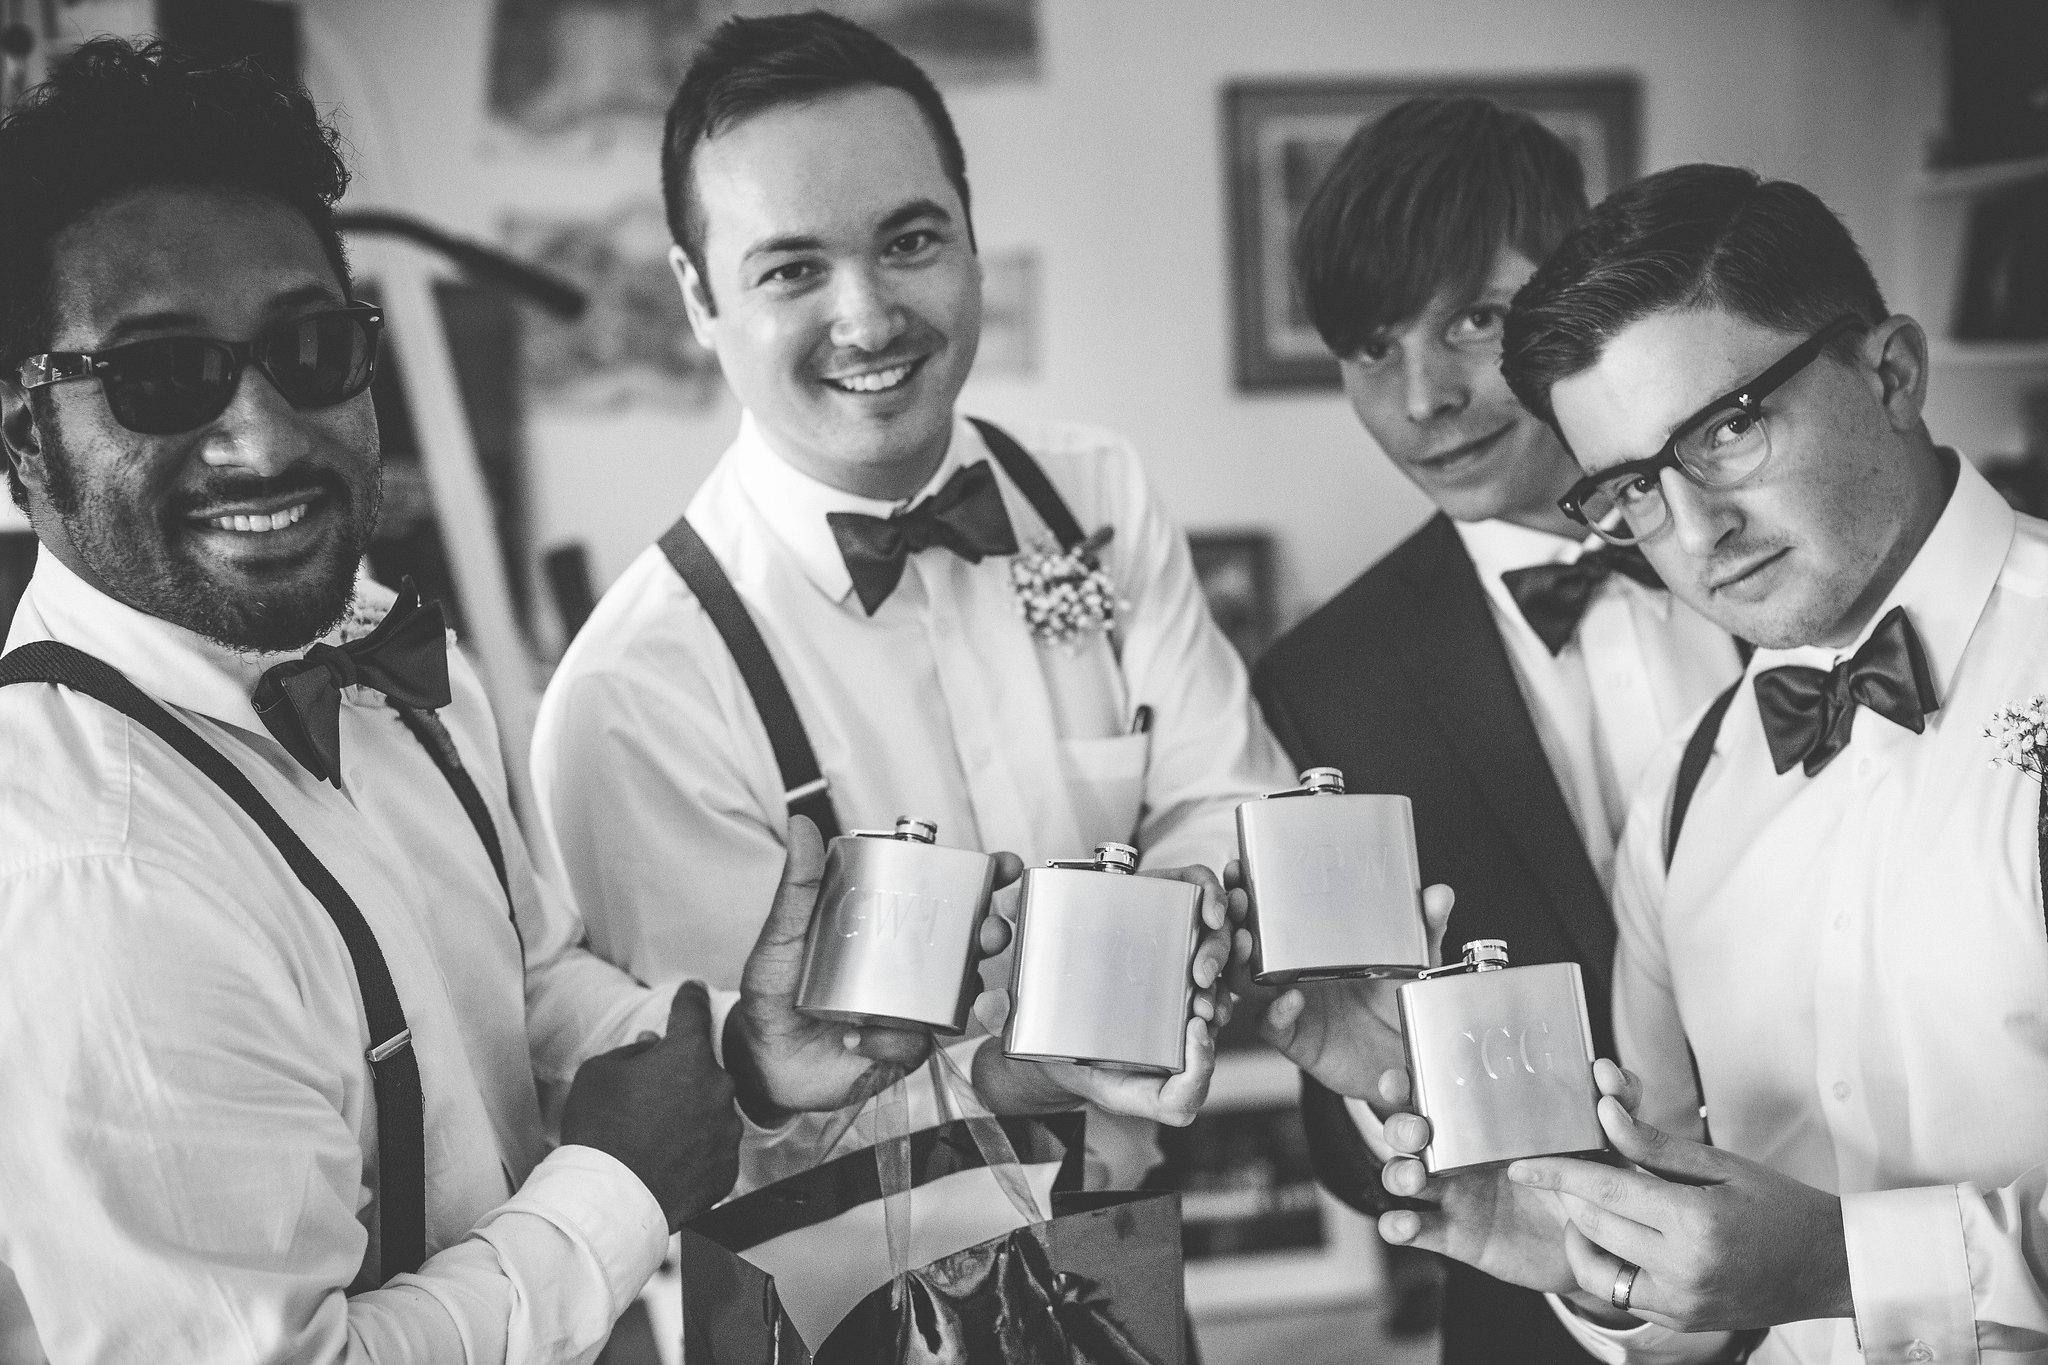 bellingham-wedding-backayard-by-seattle-wedding-photographer-adina-preston-25.jpg